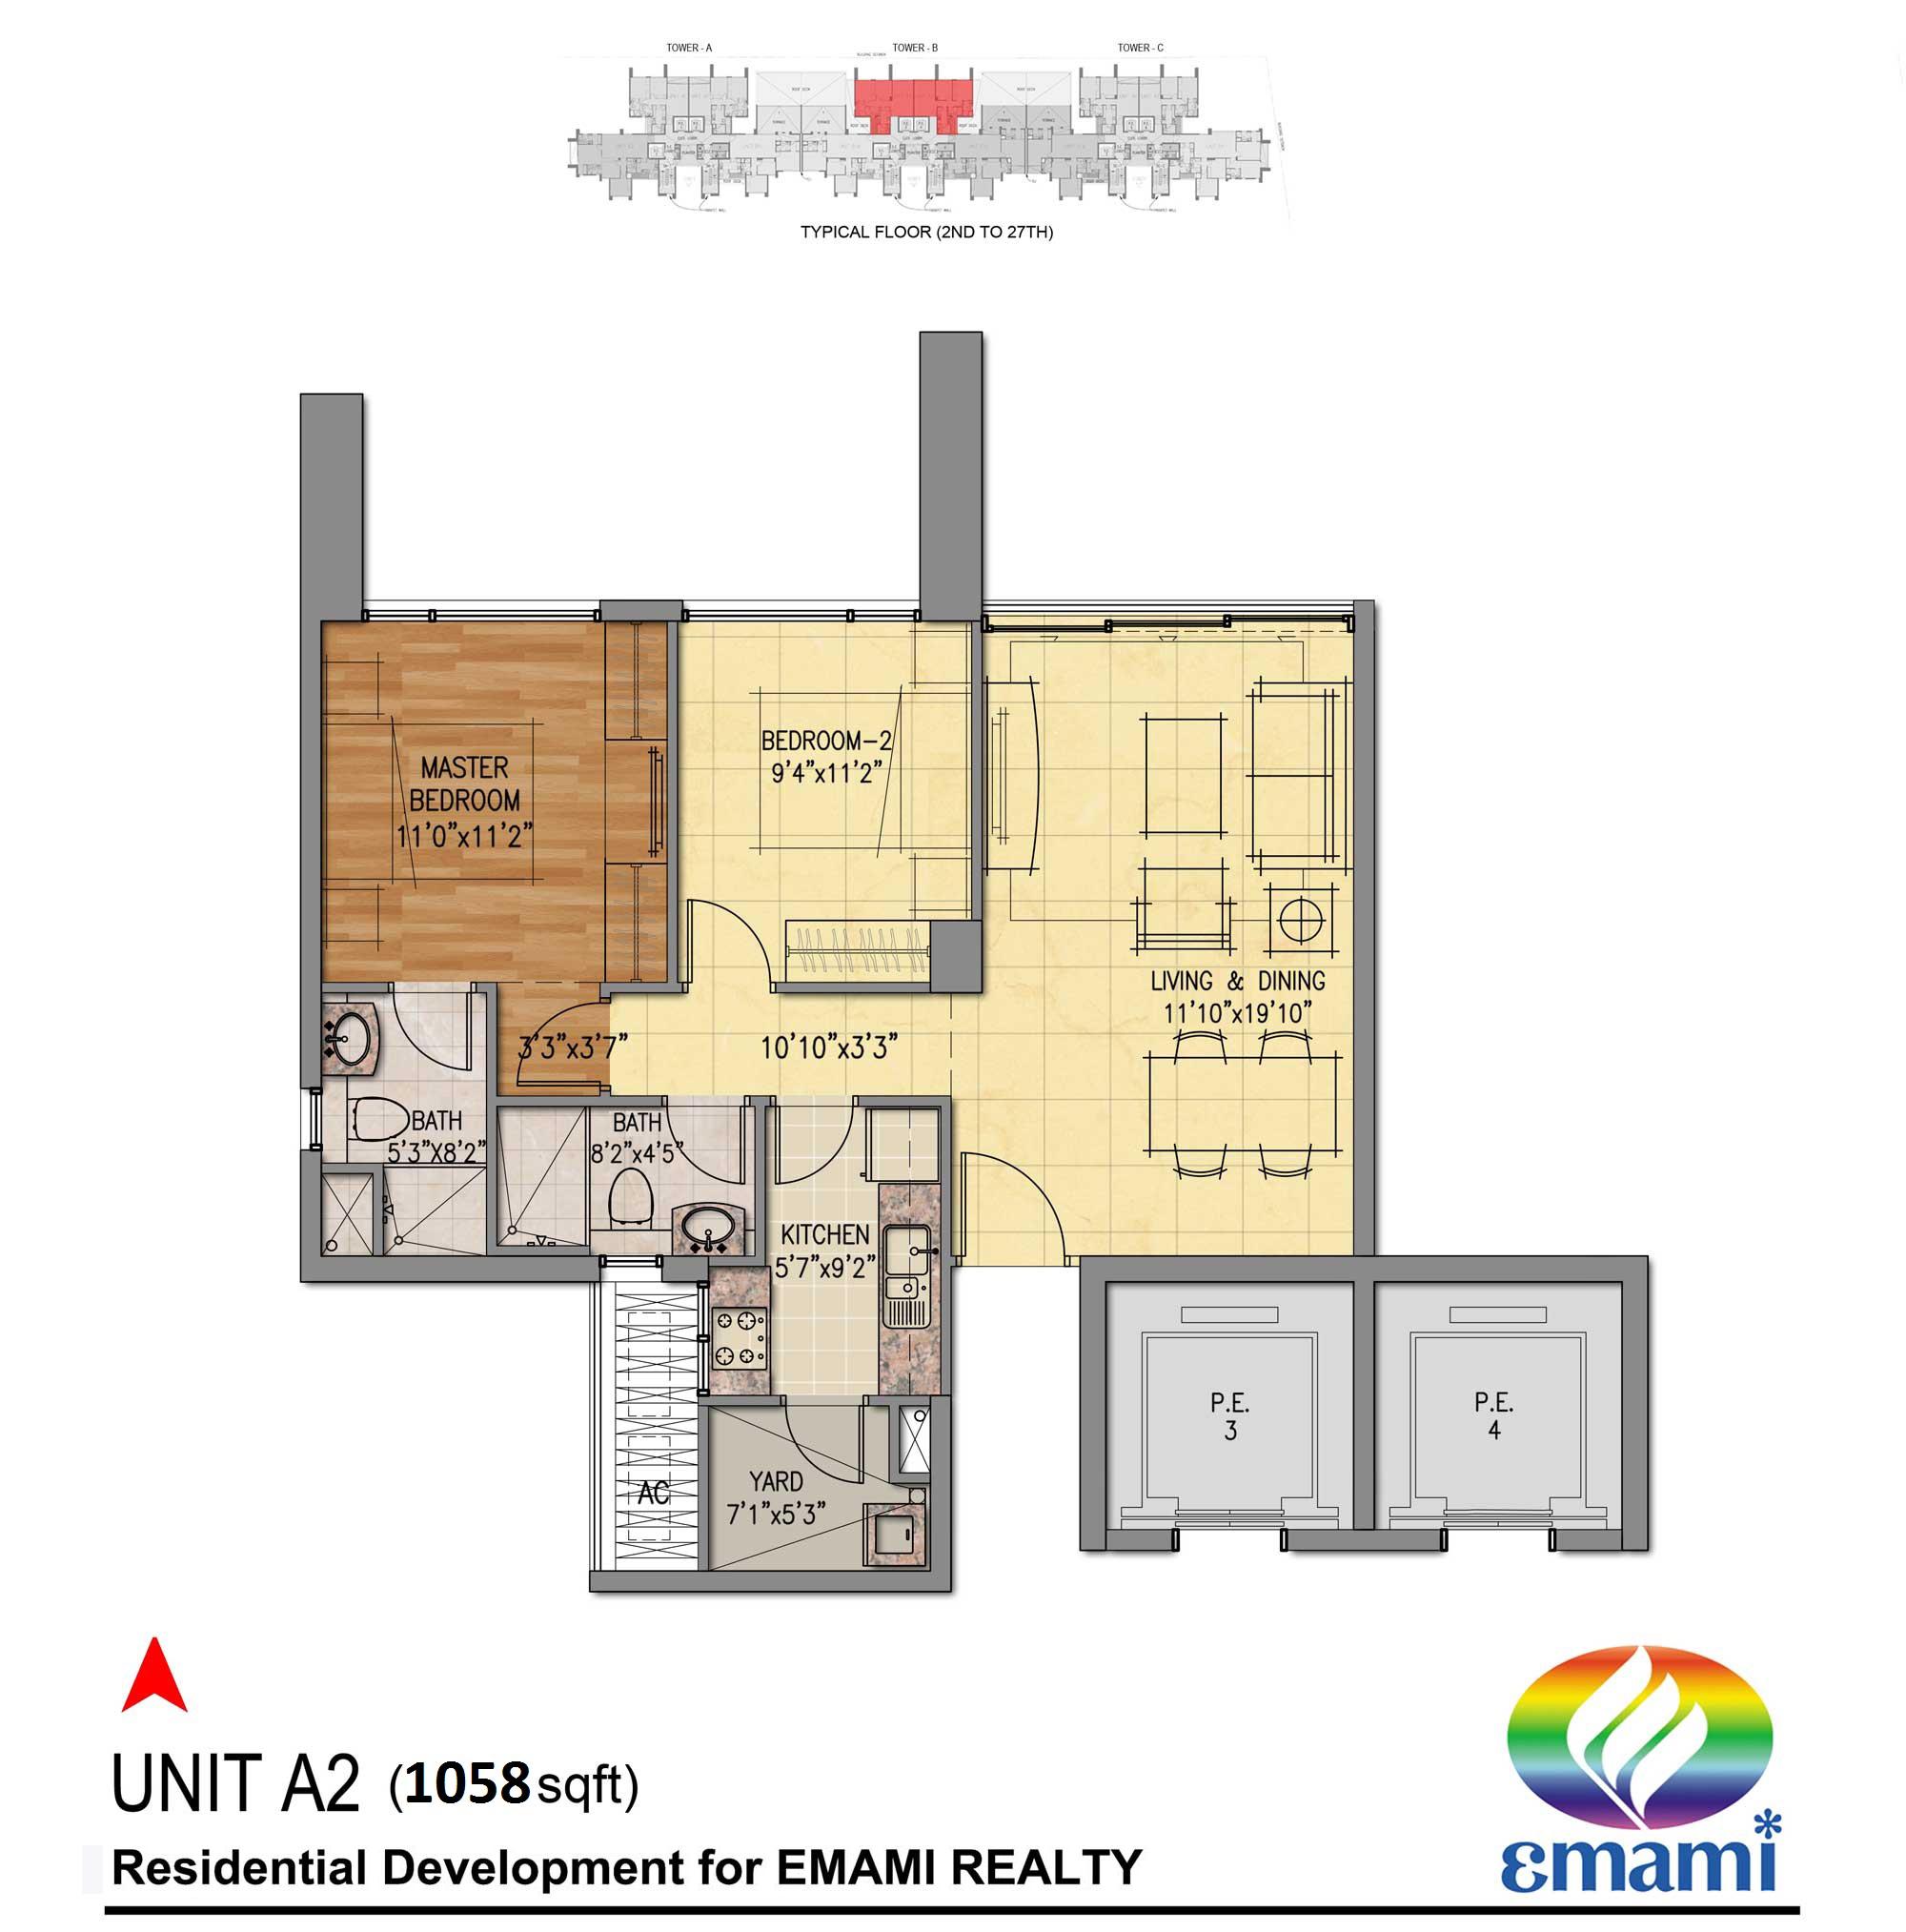 emami tejomaya apartment 2bhk 1058sqft 1